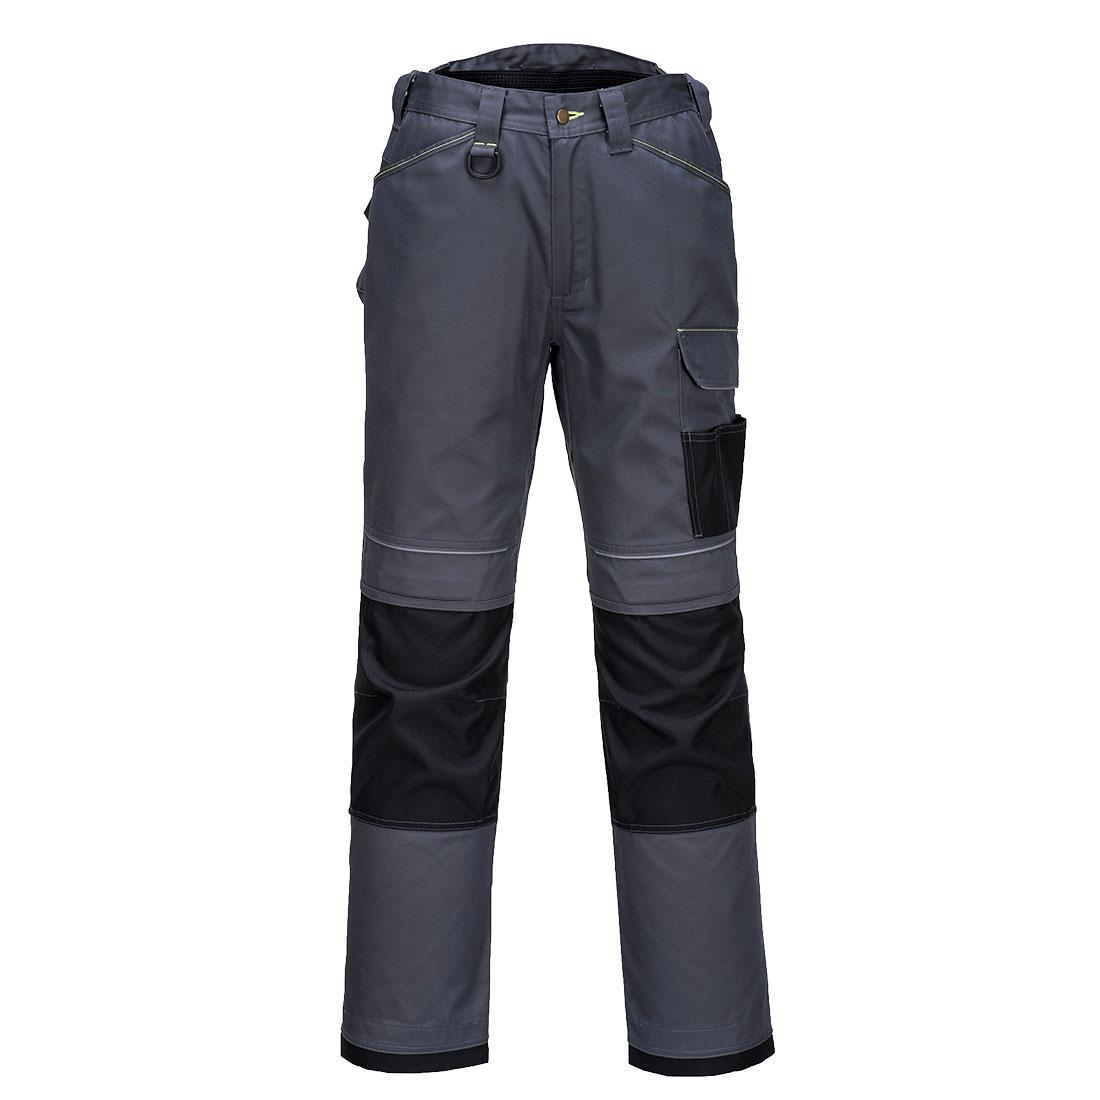 PW3 Work Trousers Zoom Grey/Black 41R